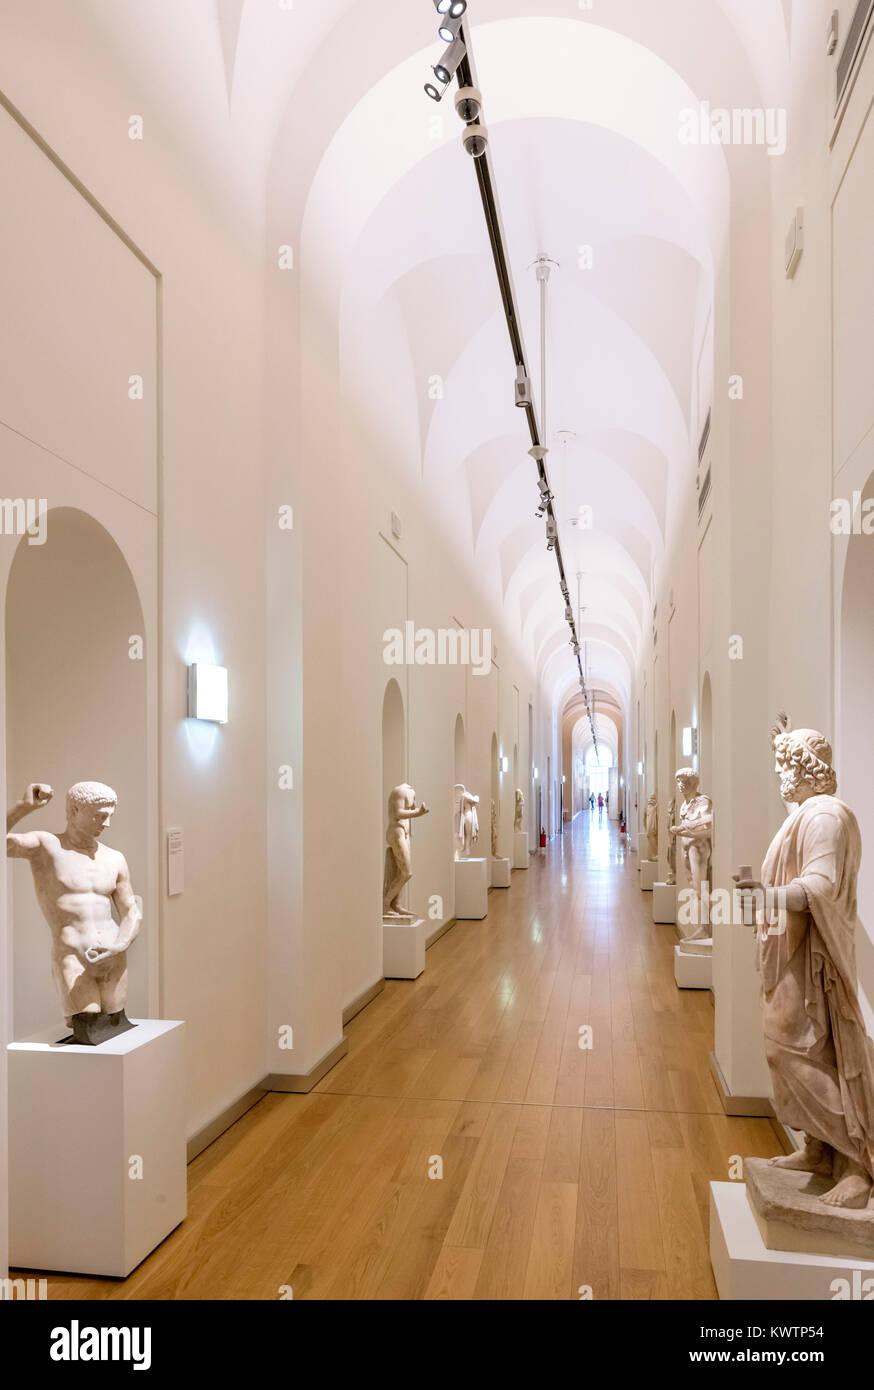 Interior of the Sabauda Gallery, Palazzo Reale,Turin, Piedmont, Italy - Stock Image